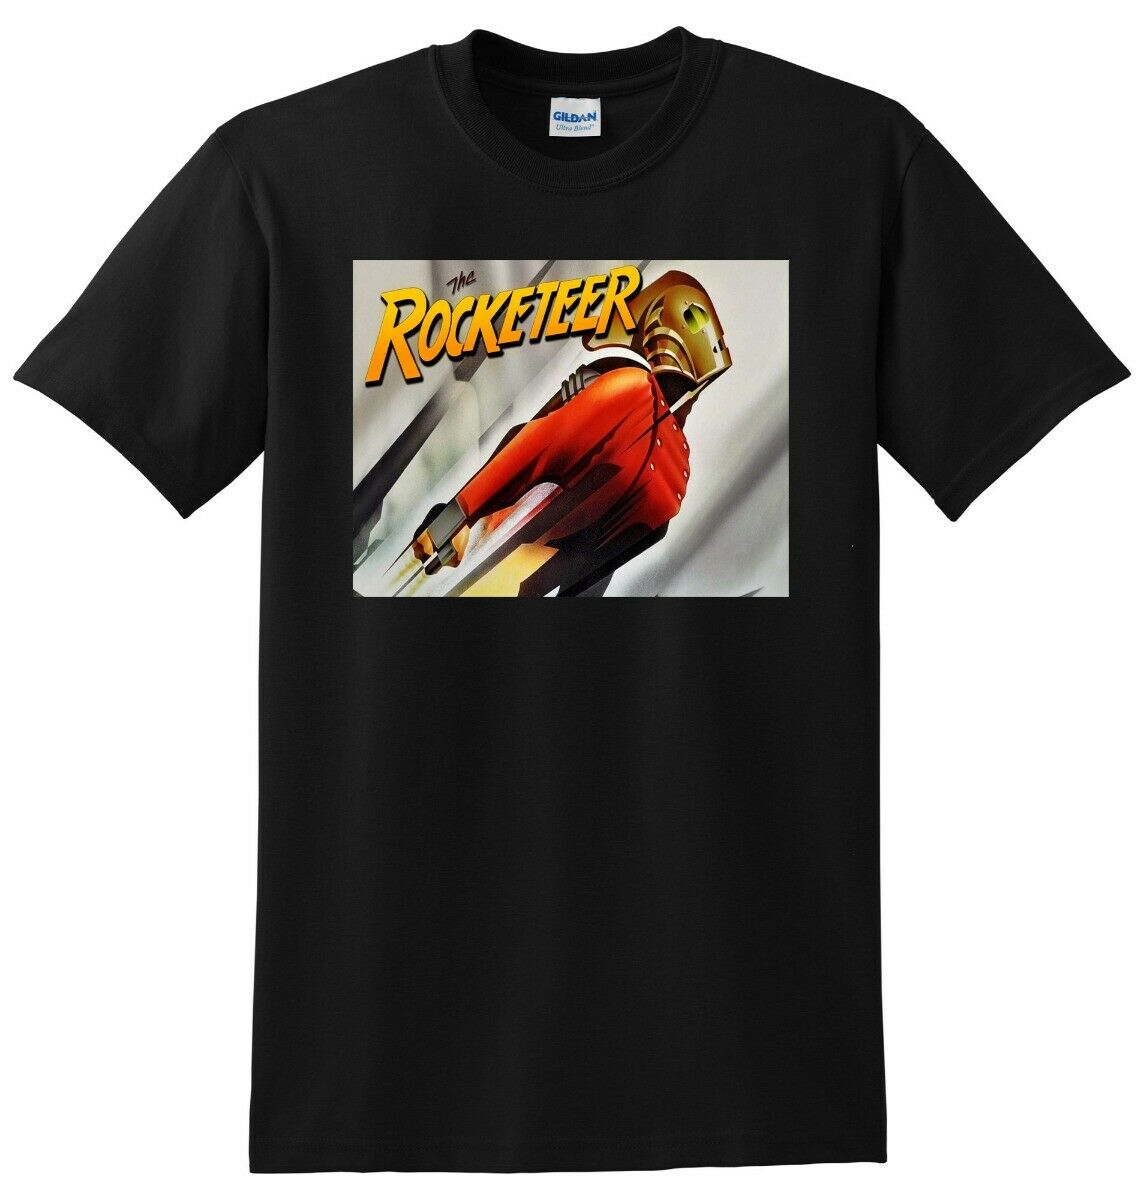 Camiseta The Rocketeer 1991 Bluray 4K Poster camiseta pequeña mediana grande o Xl